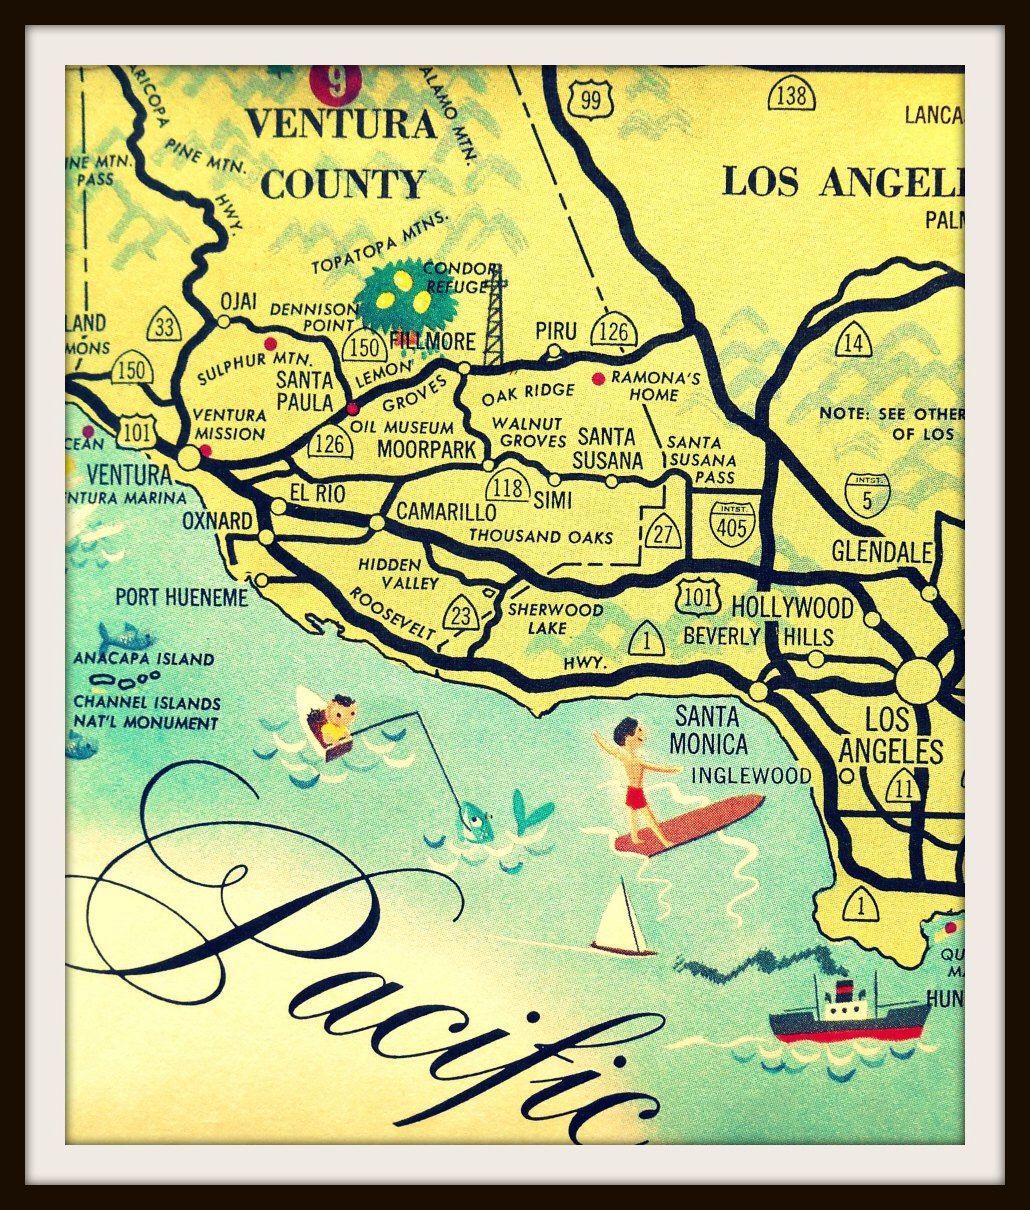 Vintage California Art Los Angeles Map Santa Monica Map Ventura